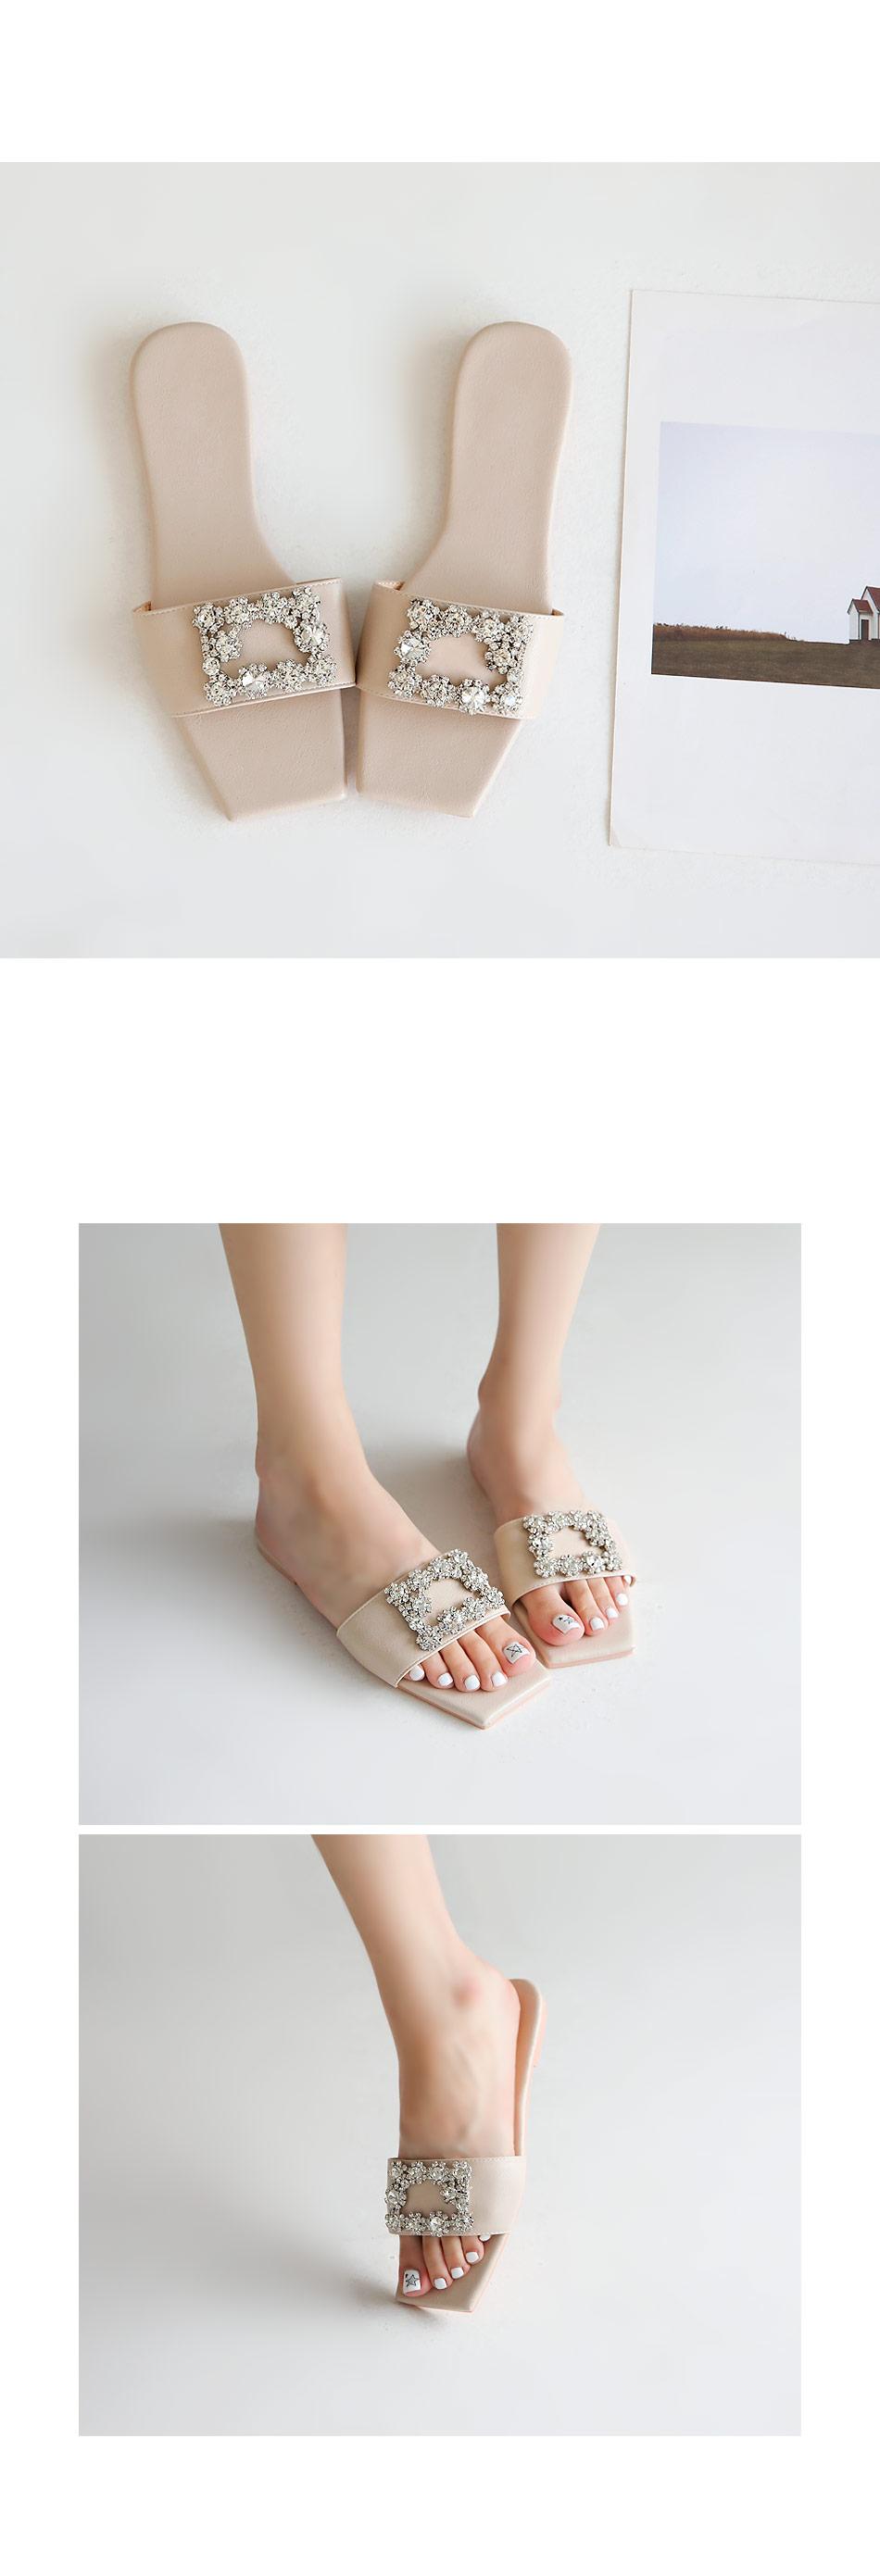 Caviel Slippers 1cm